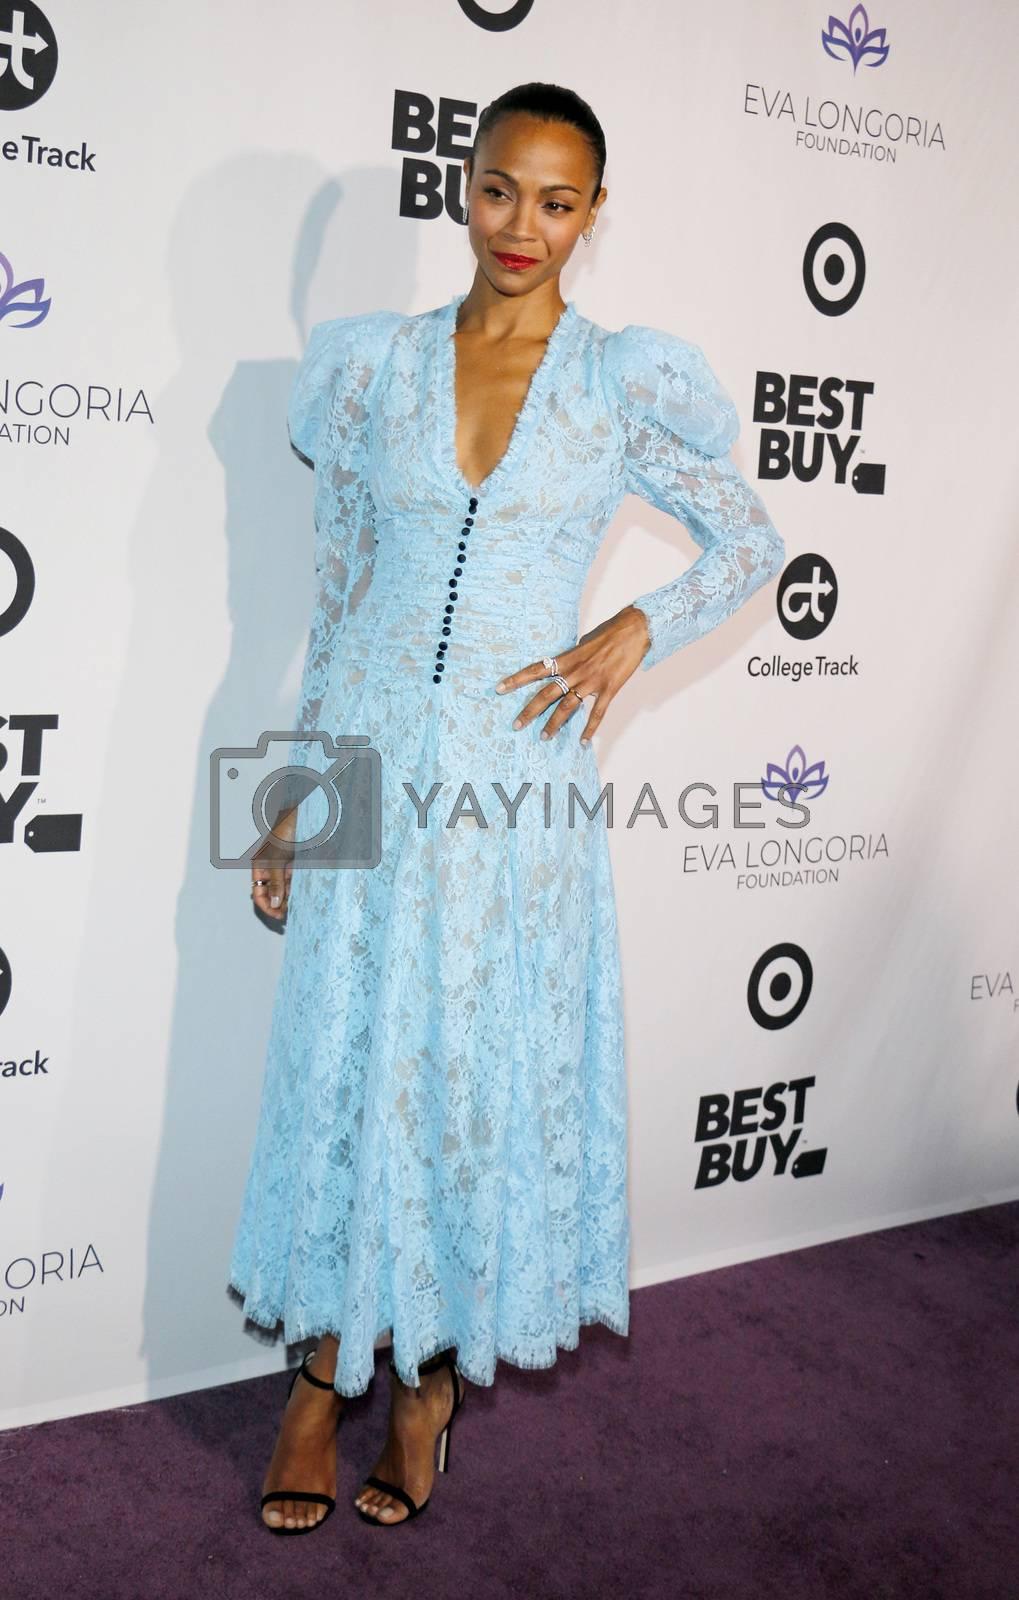 Zoe Saldana at the Eva Longoria Foundation Dinner Gala held at the Four Seasons Hotel in Beverly Hills, USA on November 8, 2018.